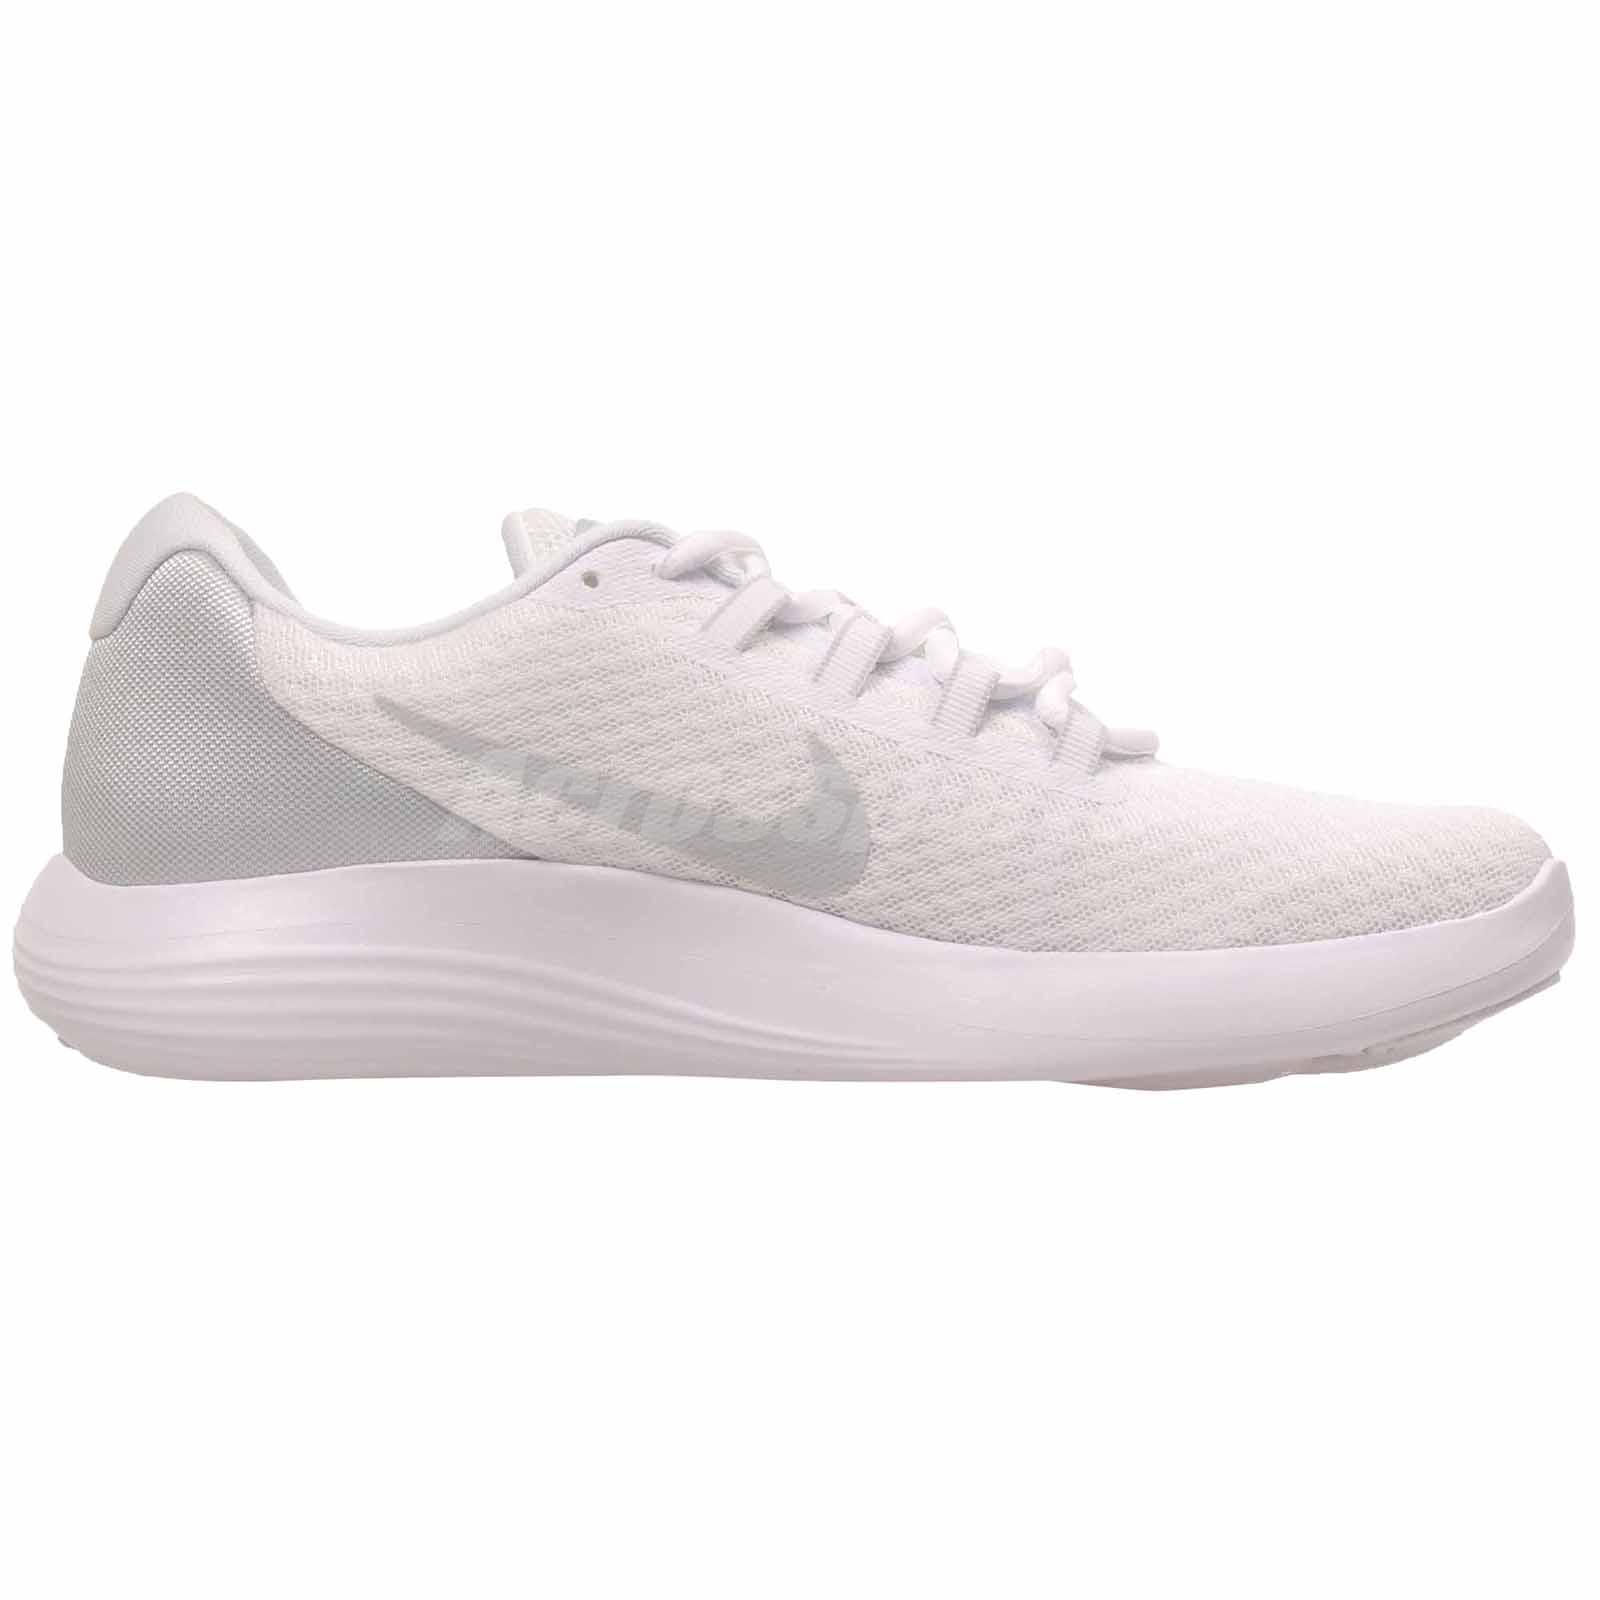 Zapatillas Nike Lunarconverge Woman 852469 002 BLACK FRIDAY